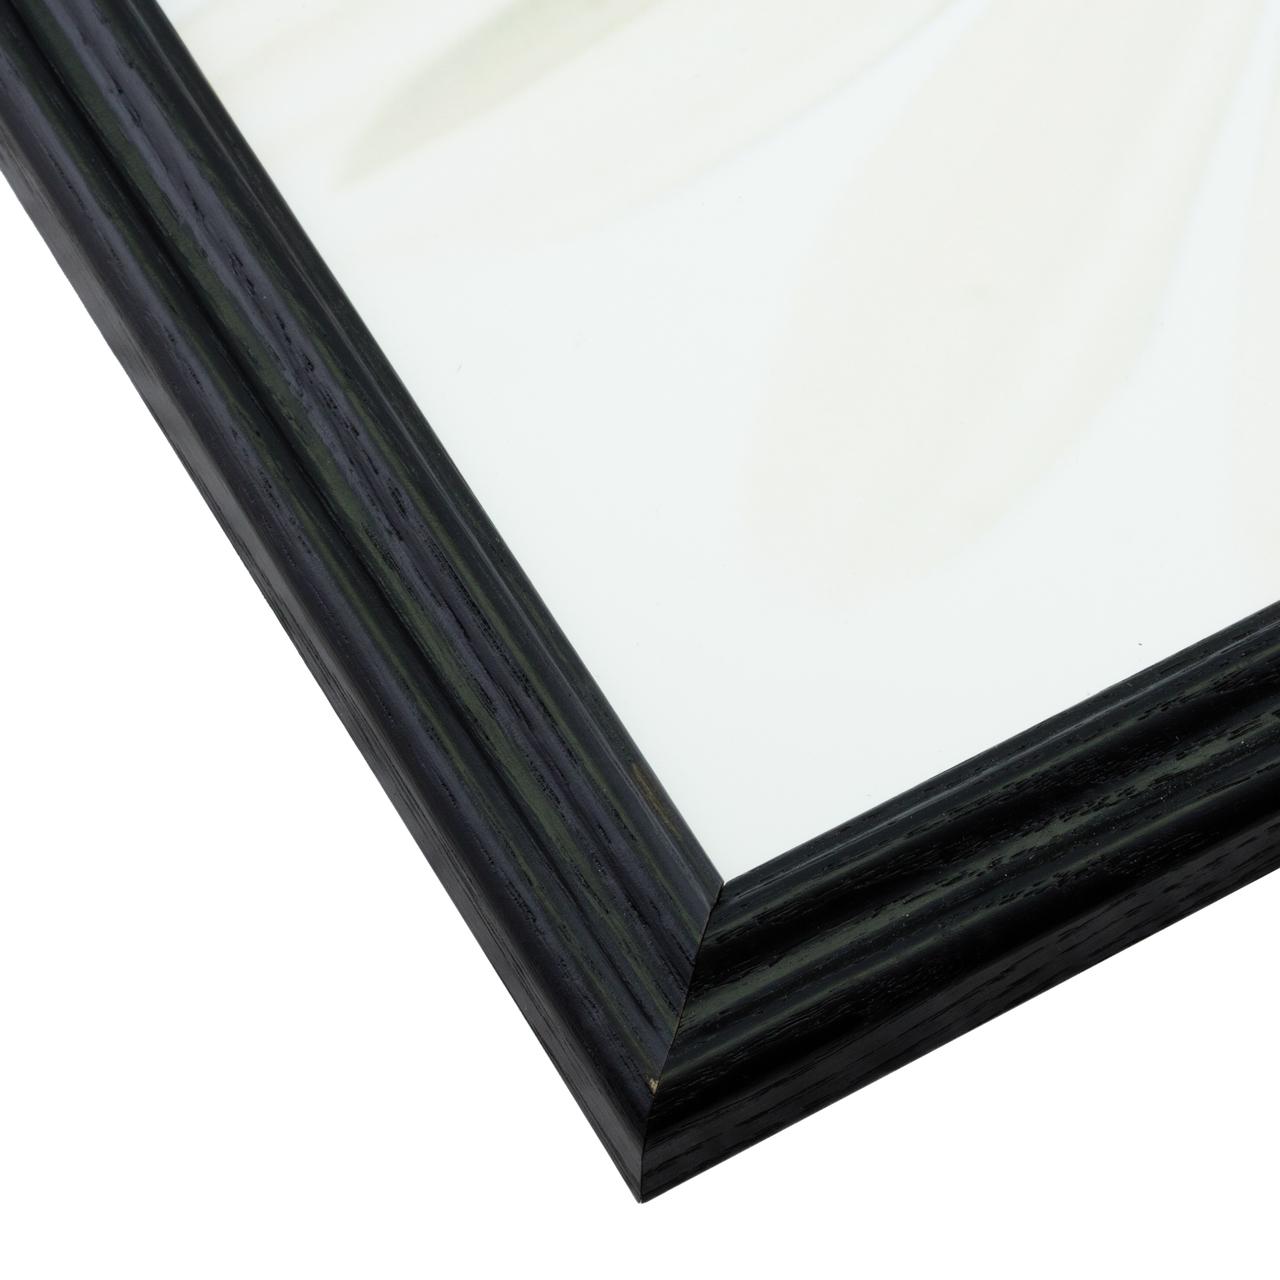 Moulding features unique wood grain patterns stained black.